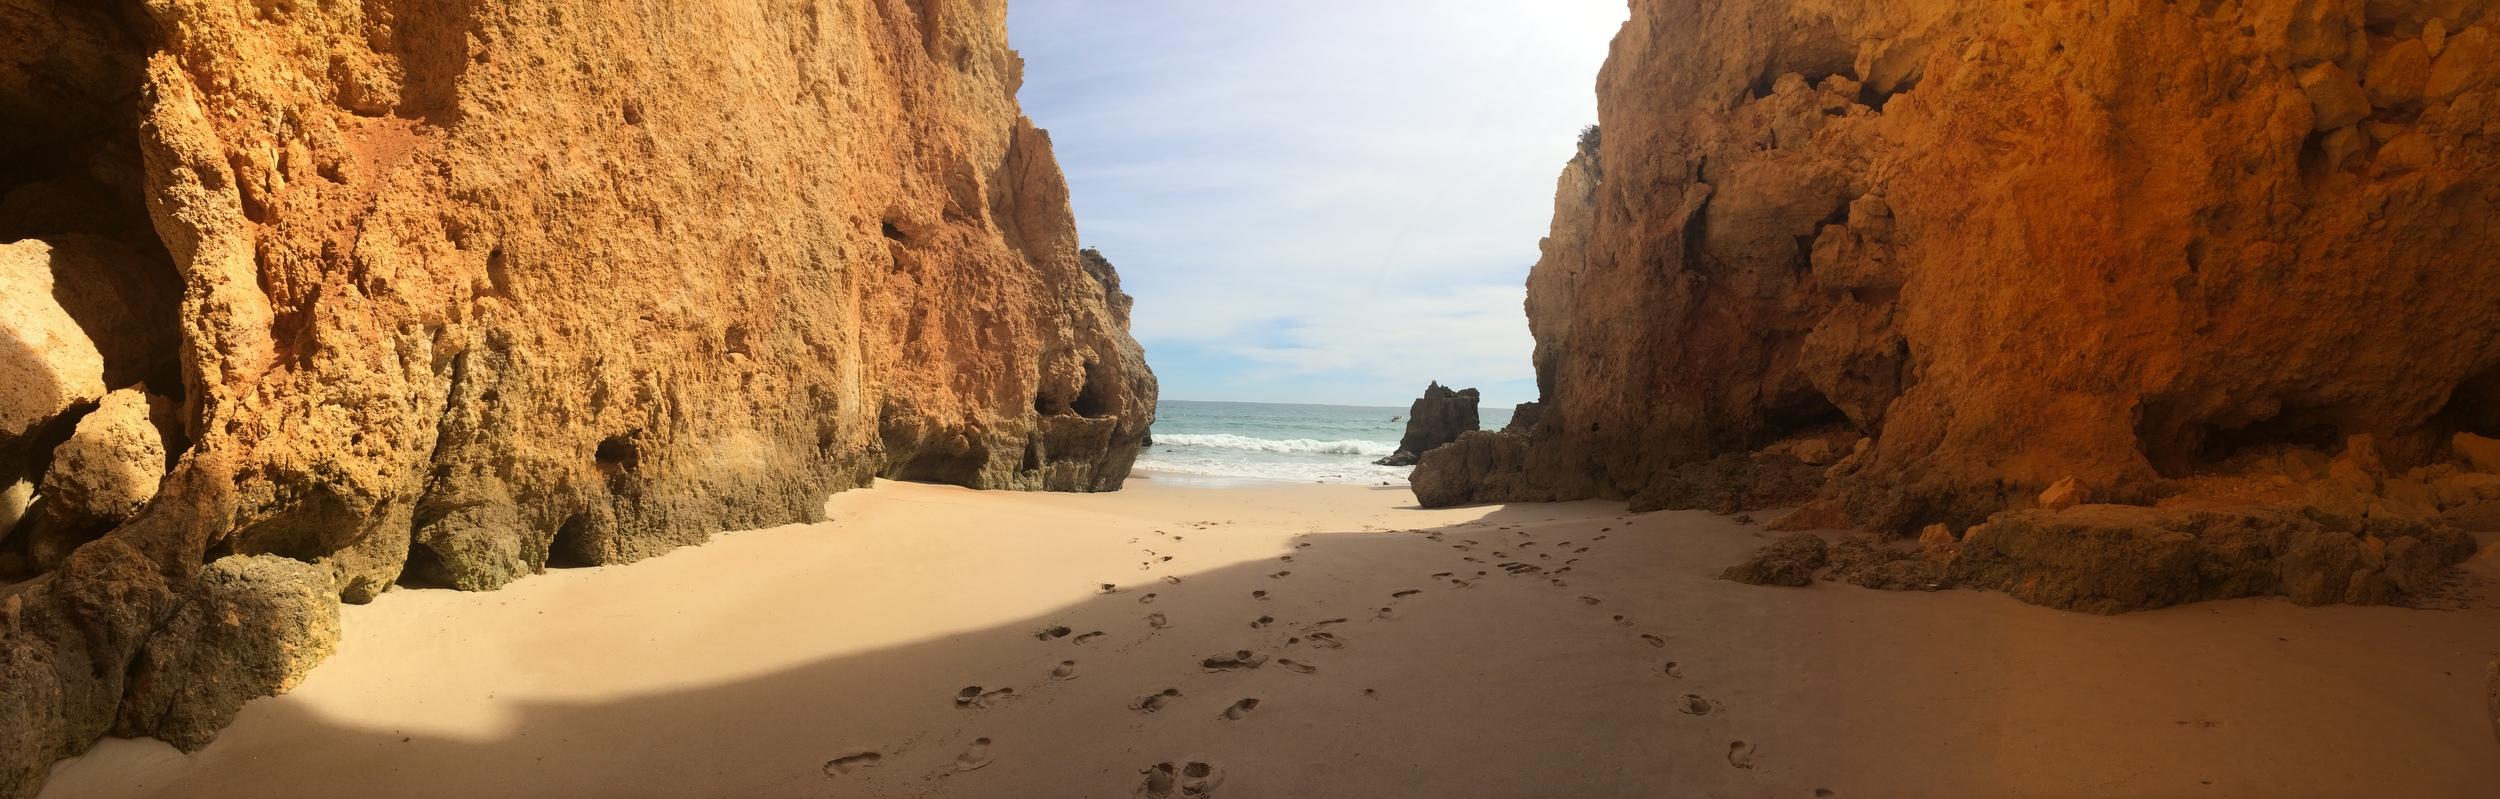 Look! My very own beach!